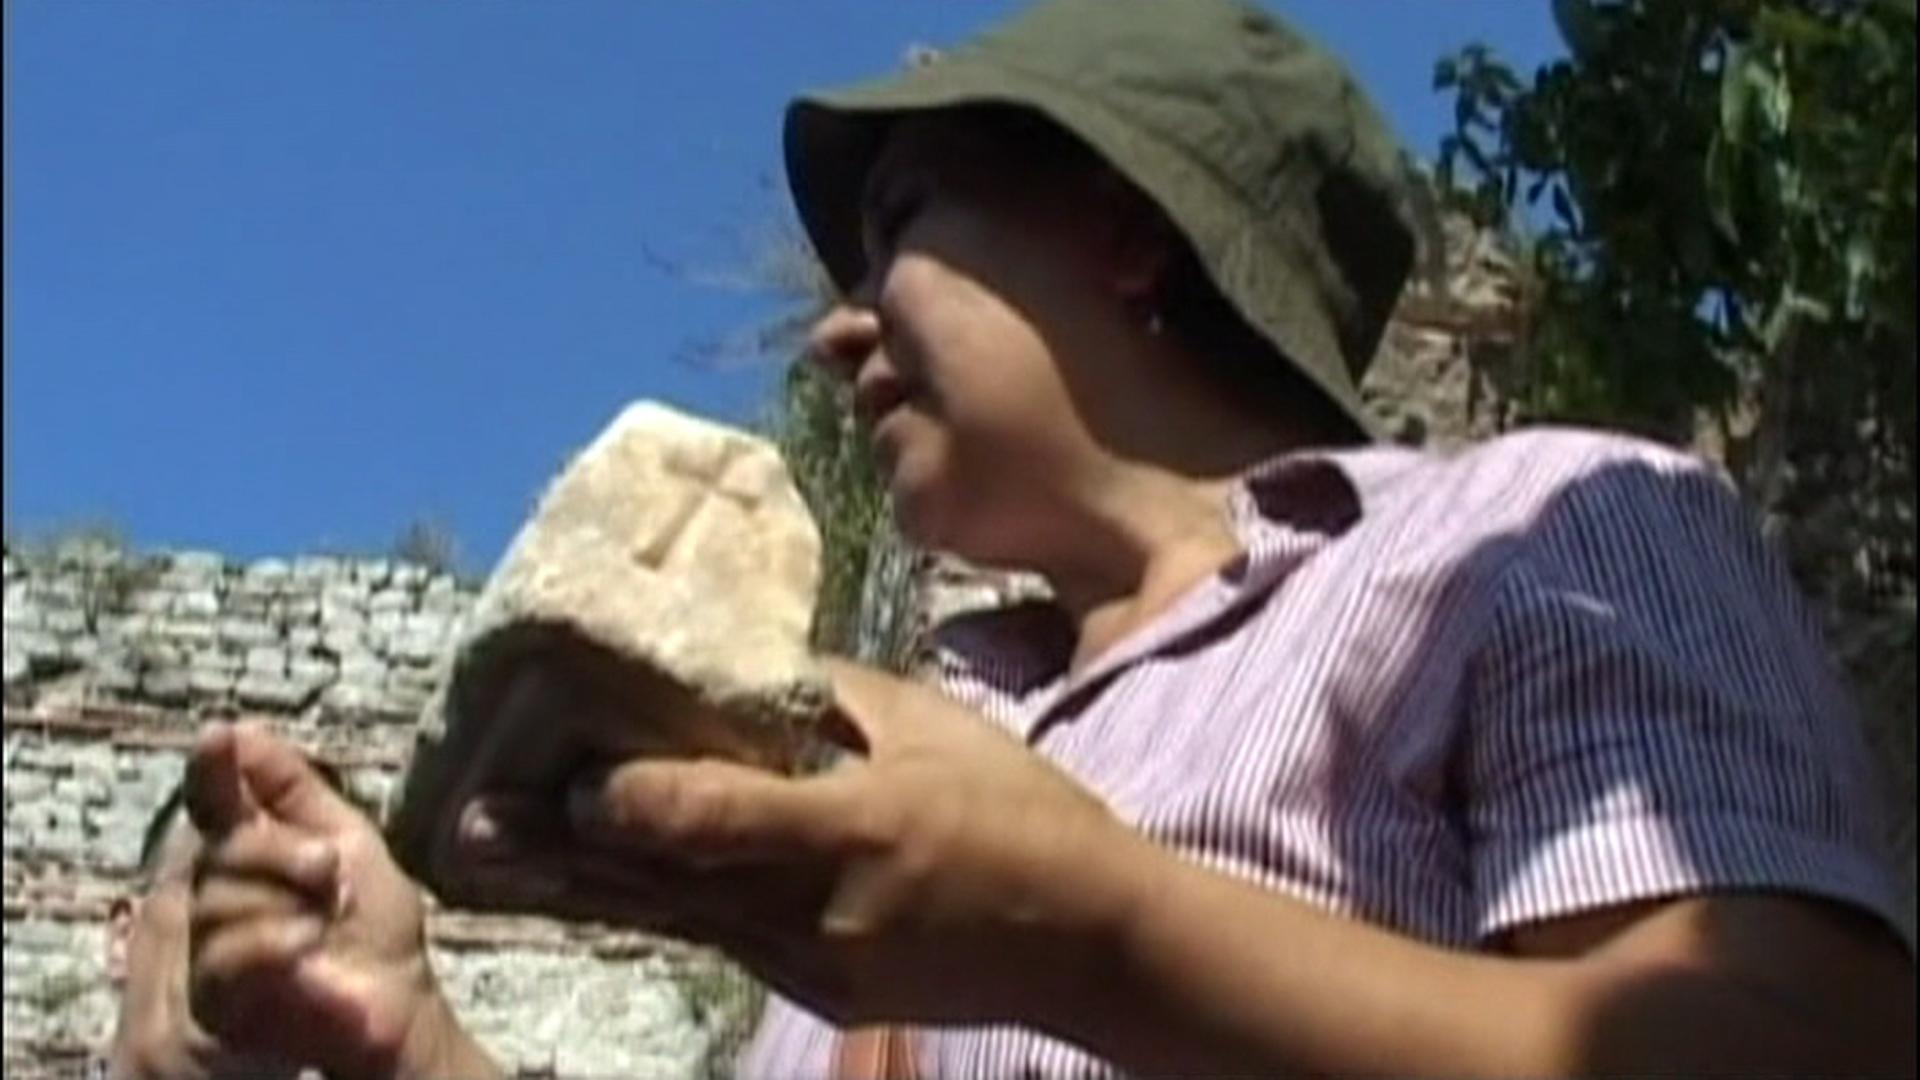 Image: Koroglu with stone